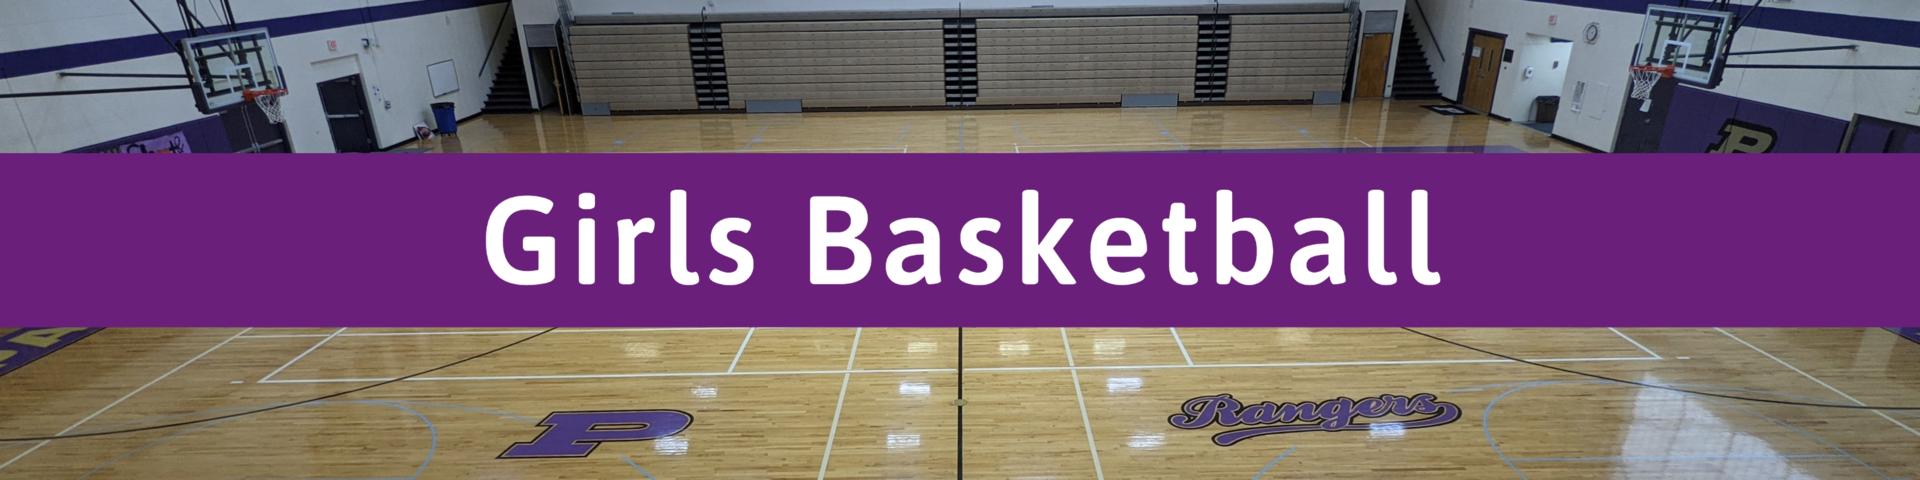 Girls Basketball header